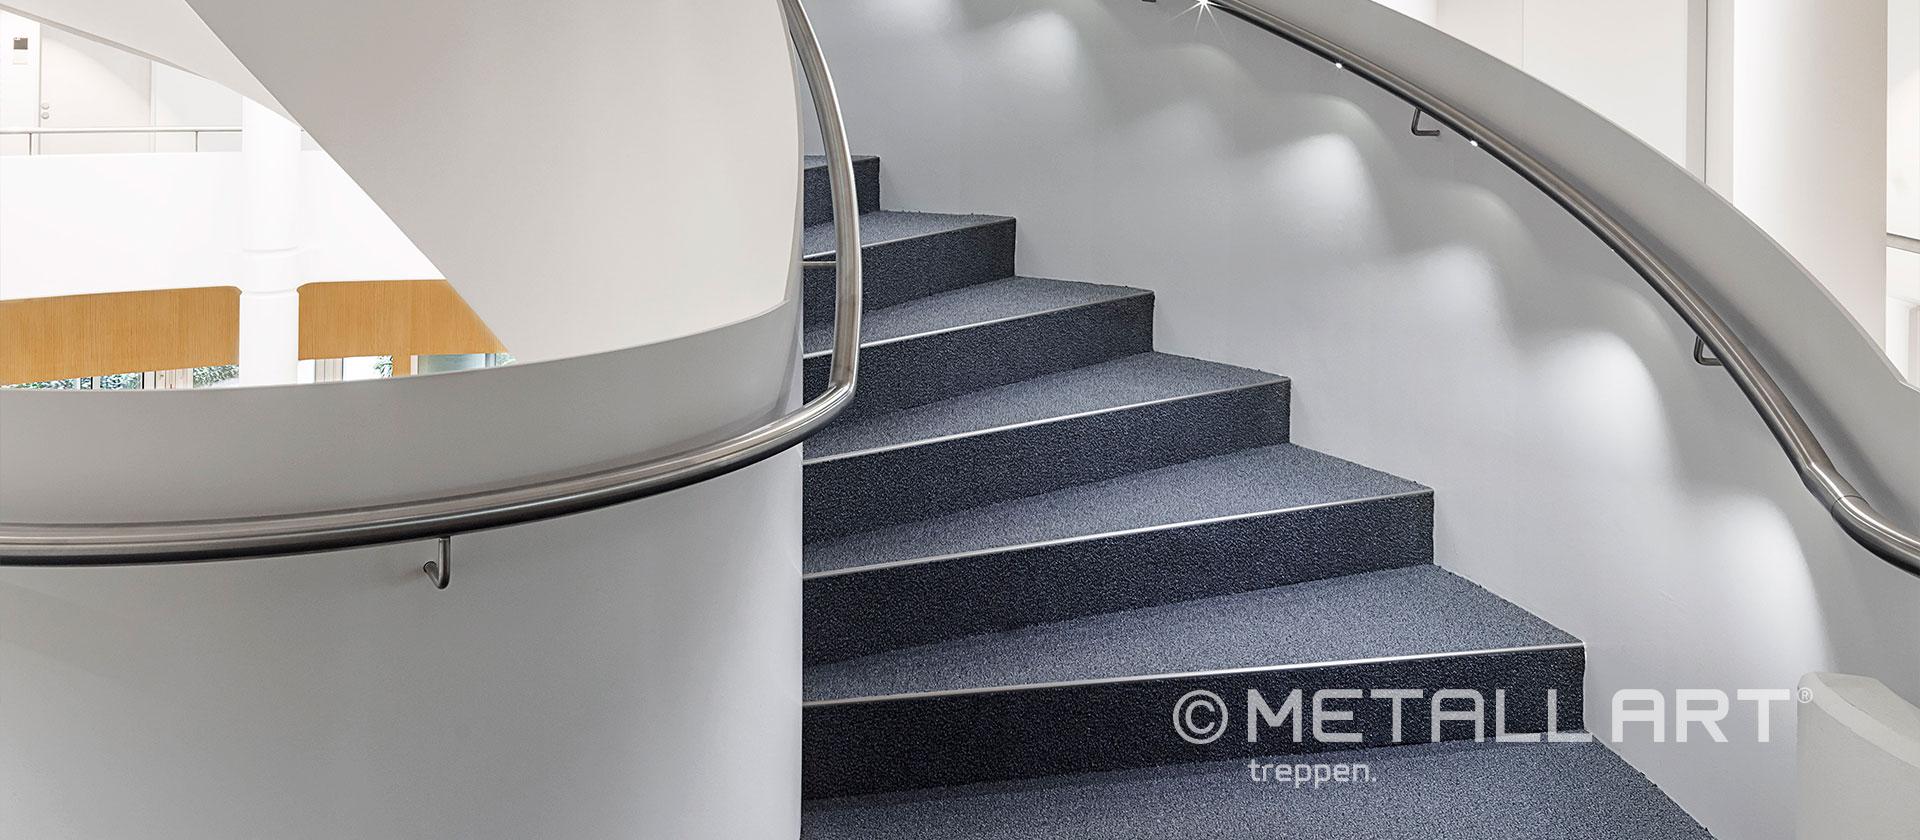 Beleuchteter Handlauf Treppe Beton